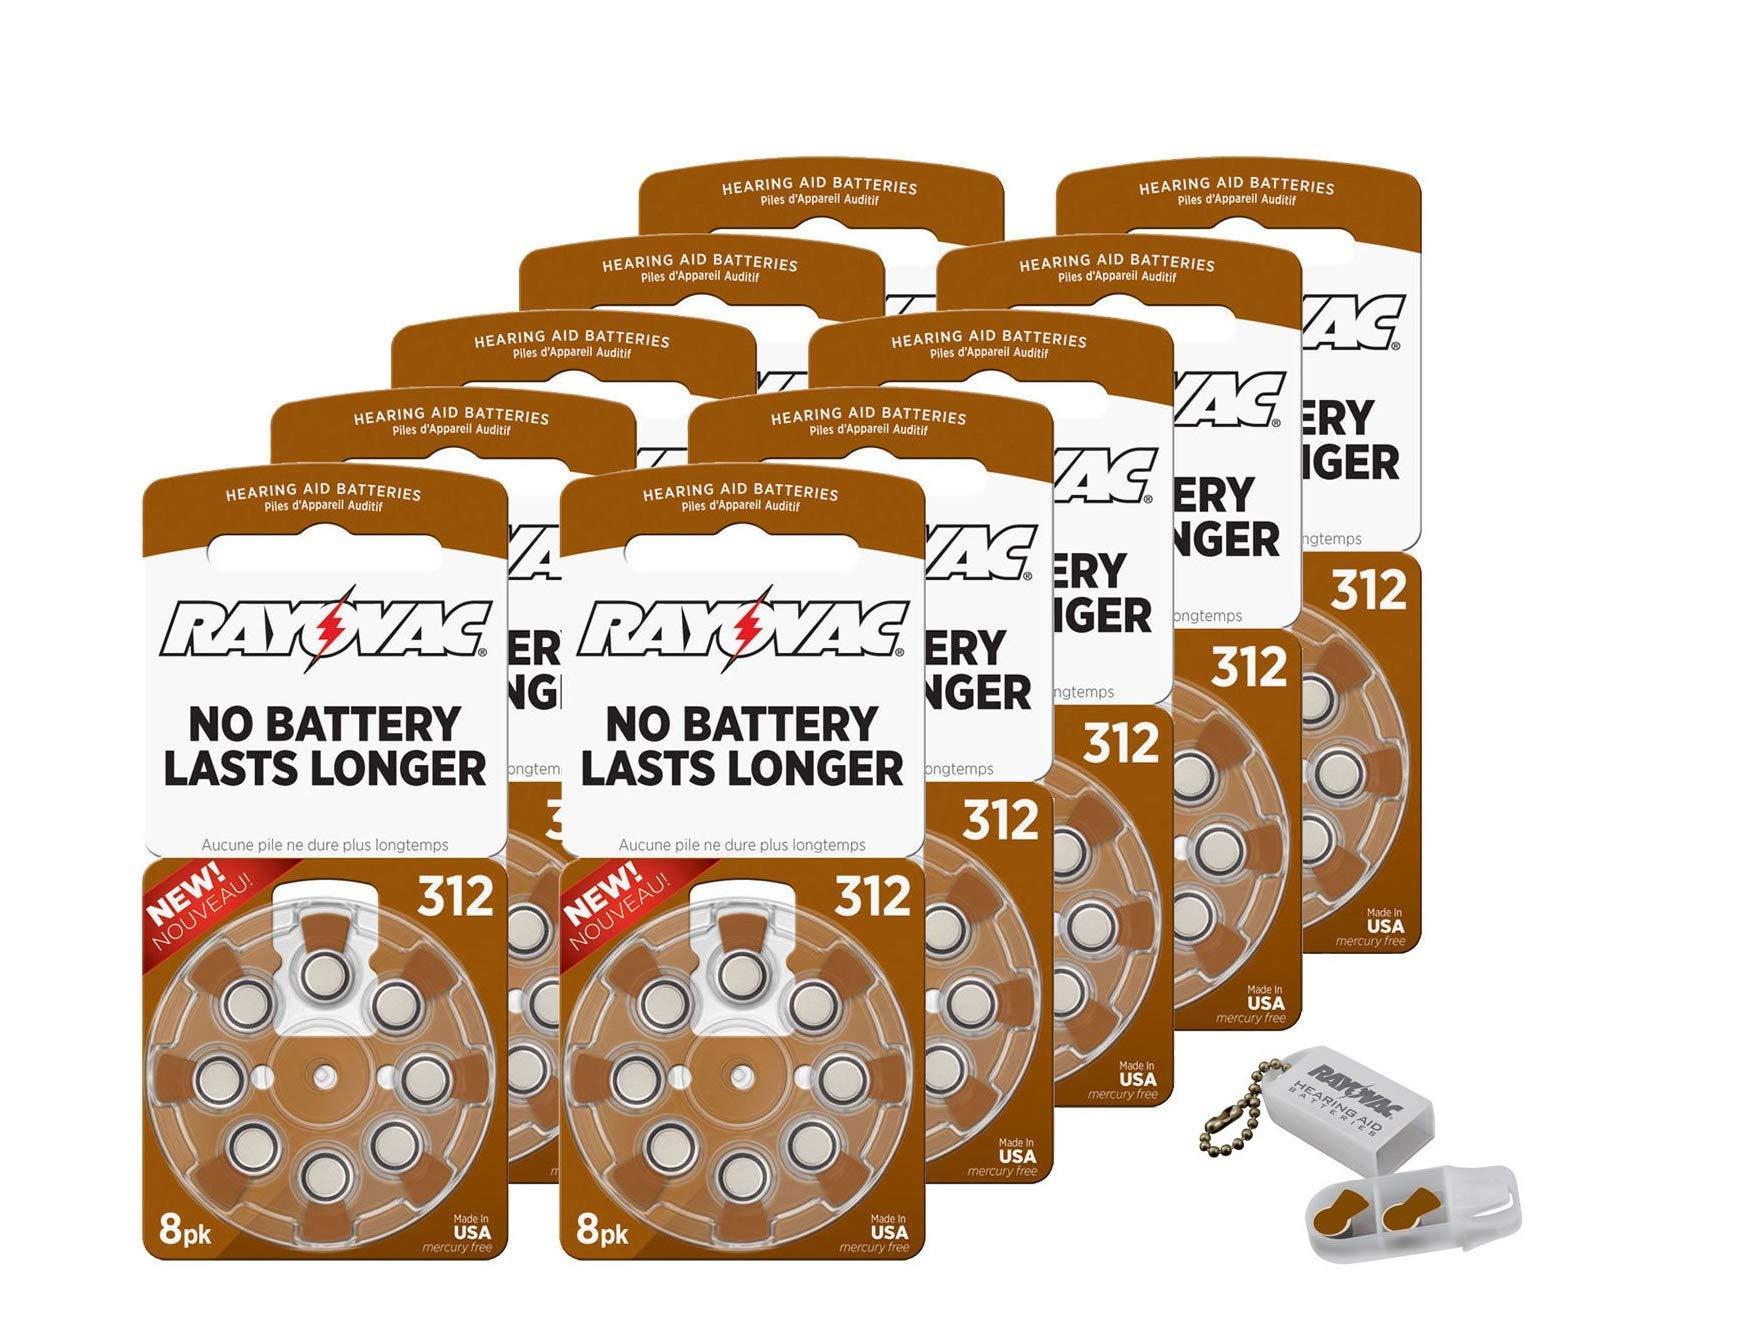 Rayovac Size 312 Extra Advanced Mercury Free Hearing Aid Batteries + Battery Holder Keychain Kit (80 Batteries) by Rayovac